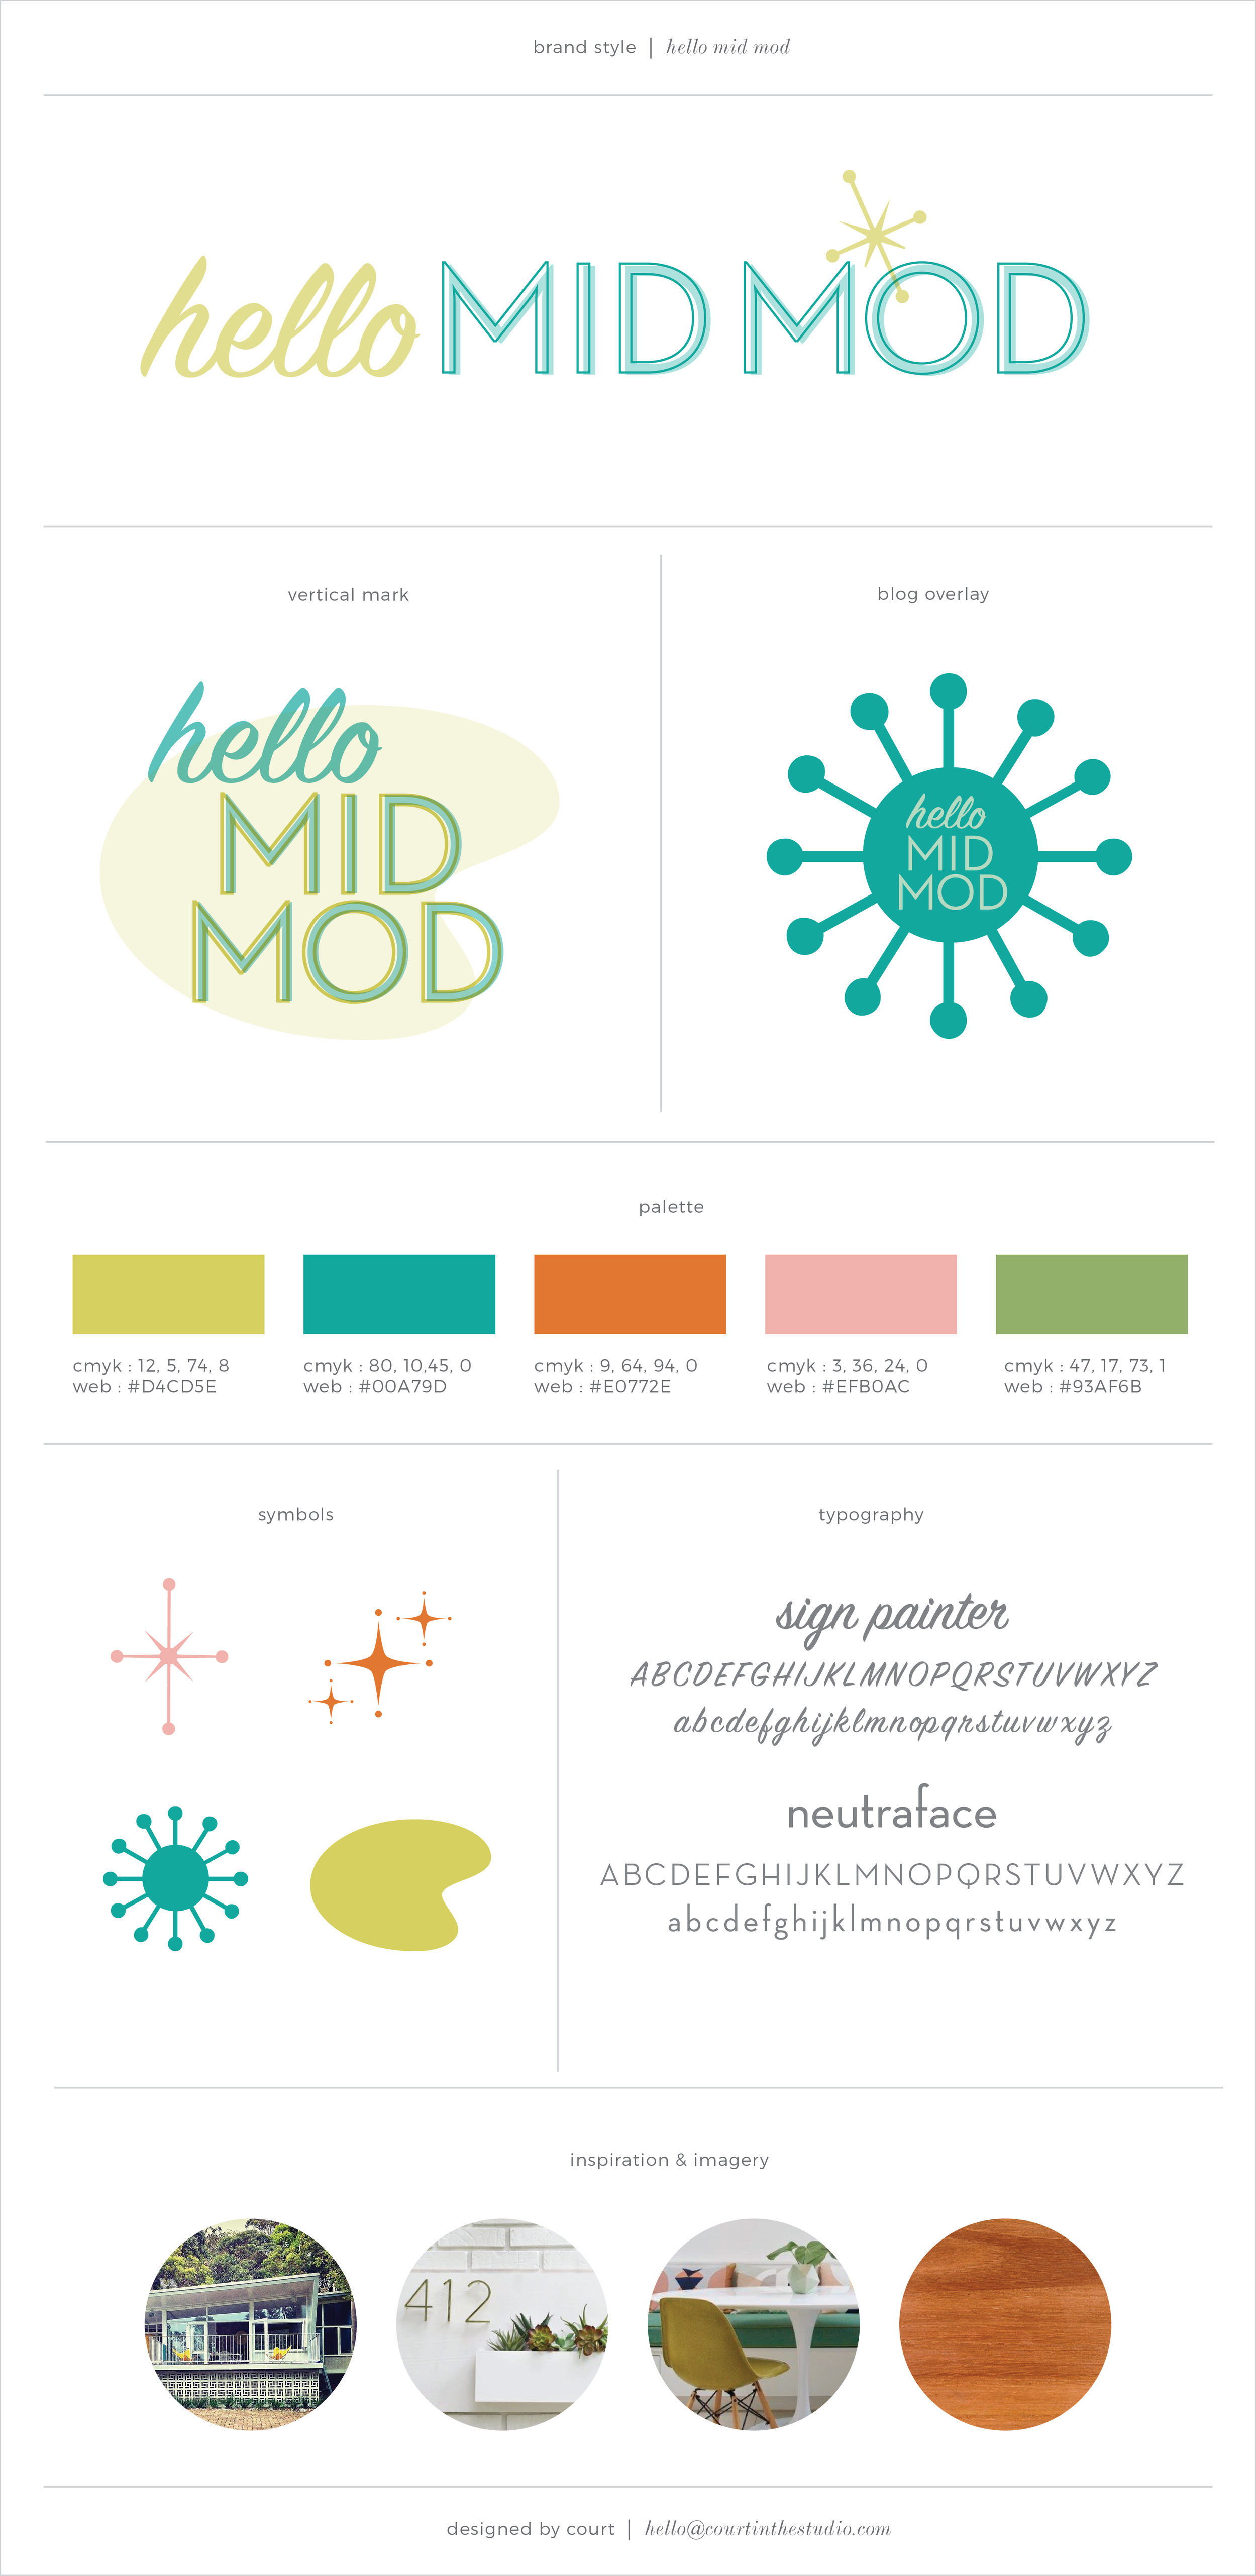 Hello Mid Mod Branding Board - Courtney Oliver